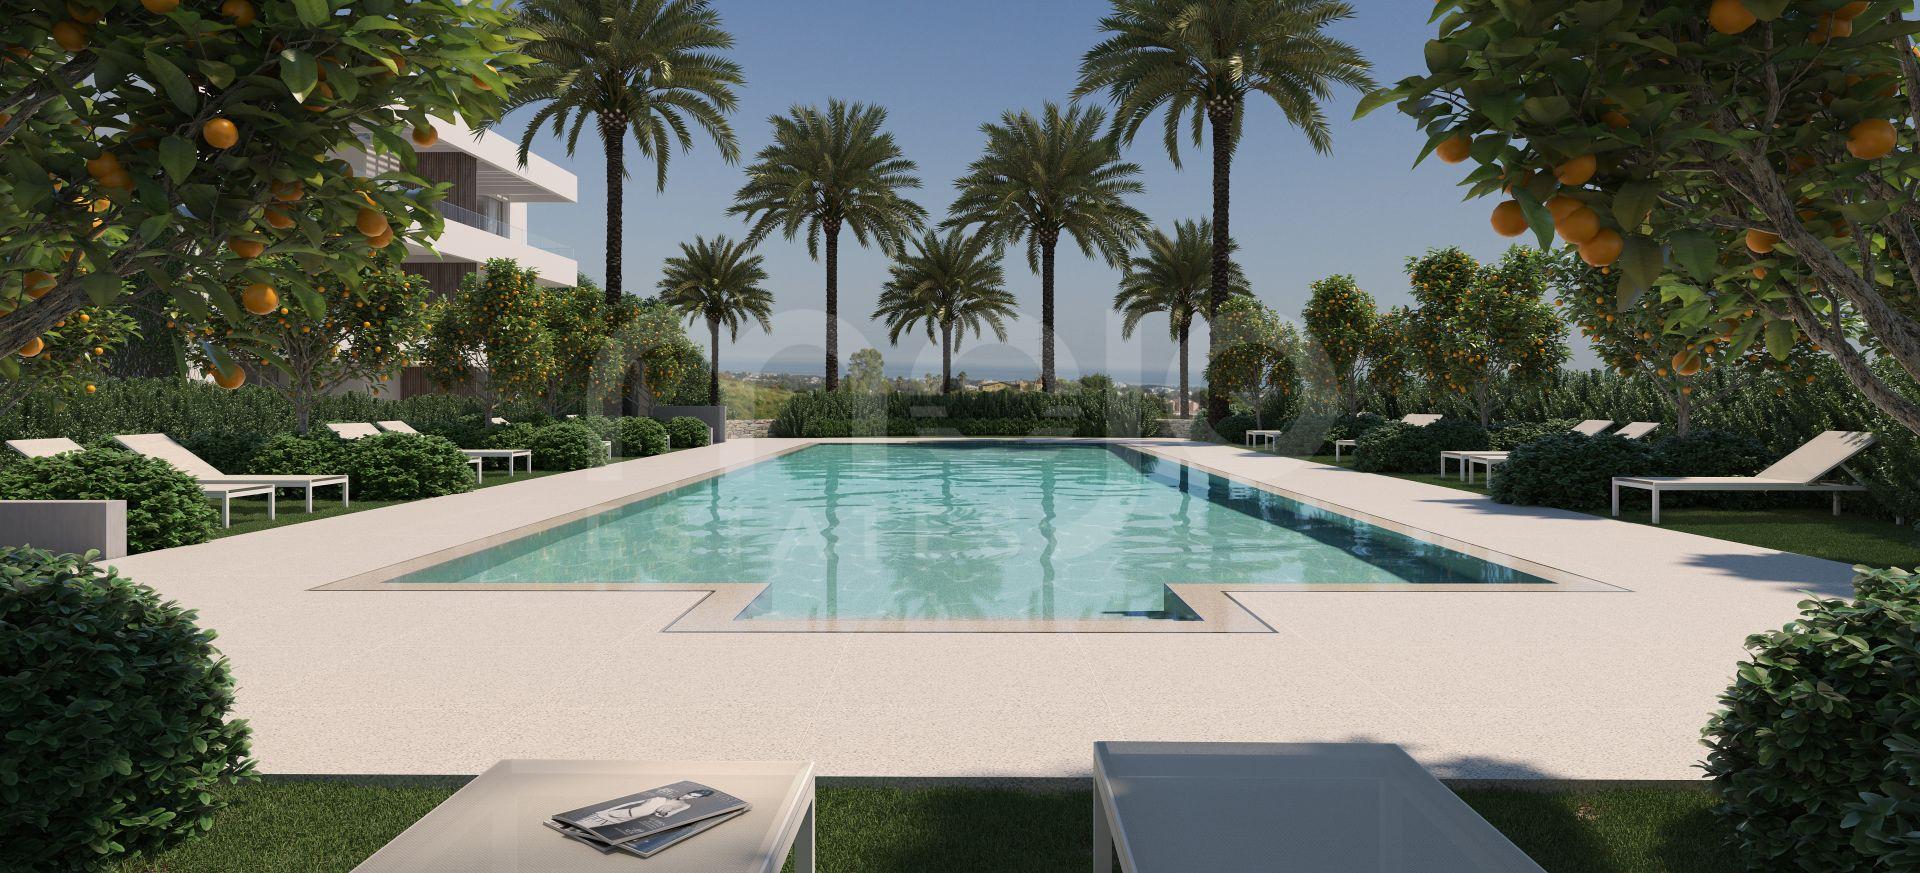 Unico Benahavis, luxury modern apartments in the coveted area of Los Arqueros